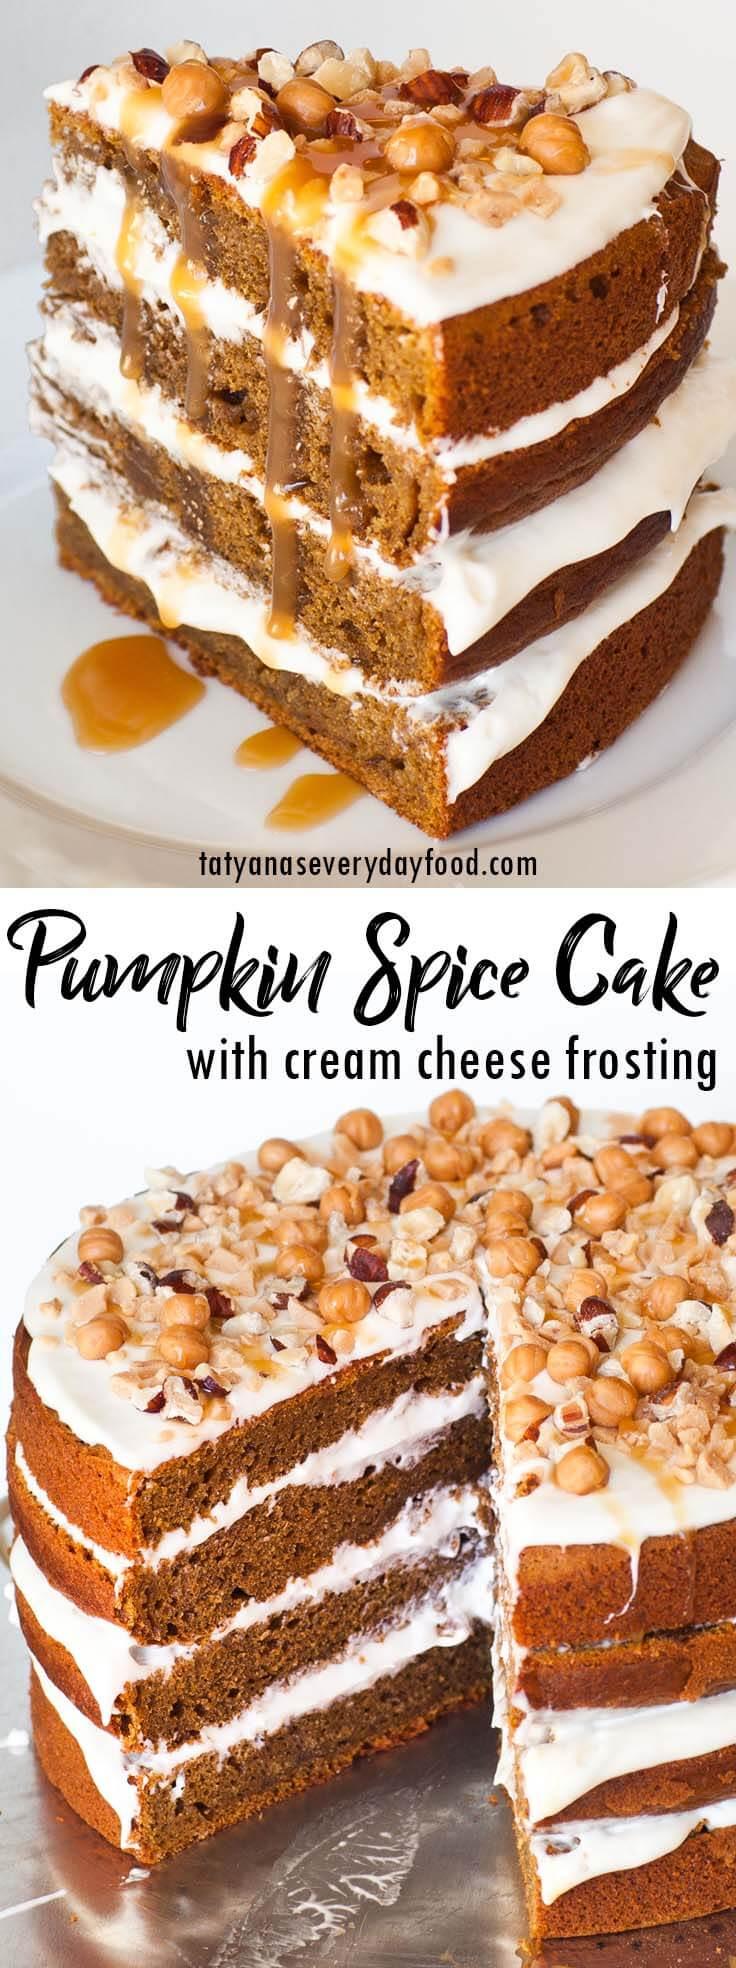 Easy Pumpkin Spice Cake video recipe